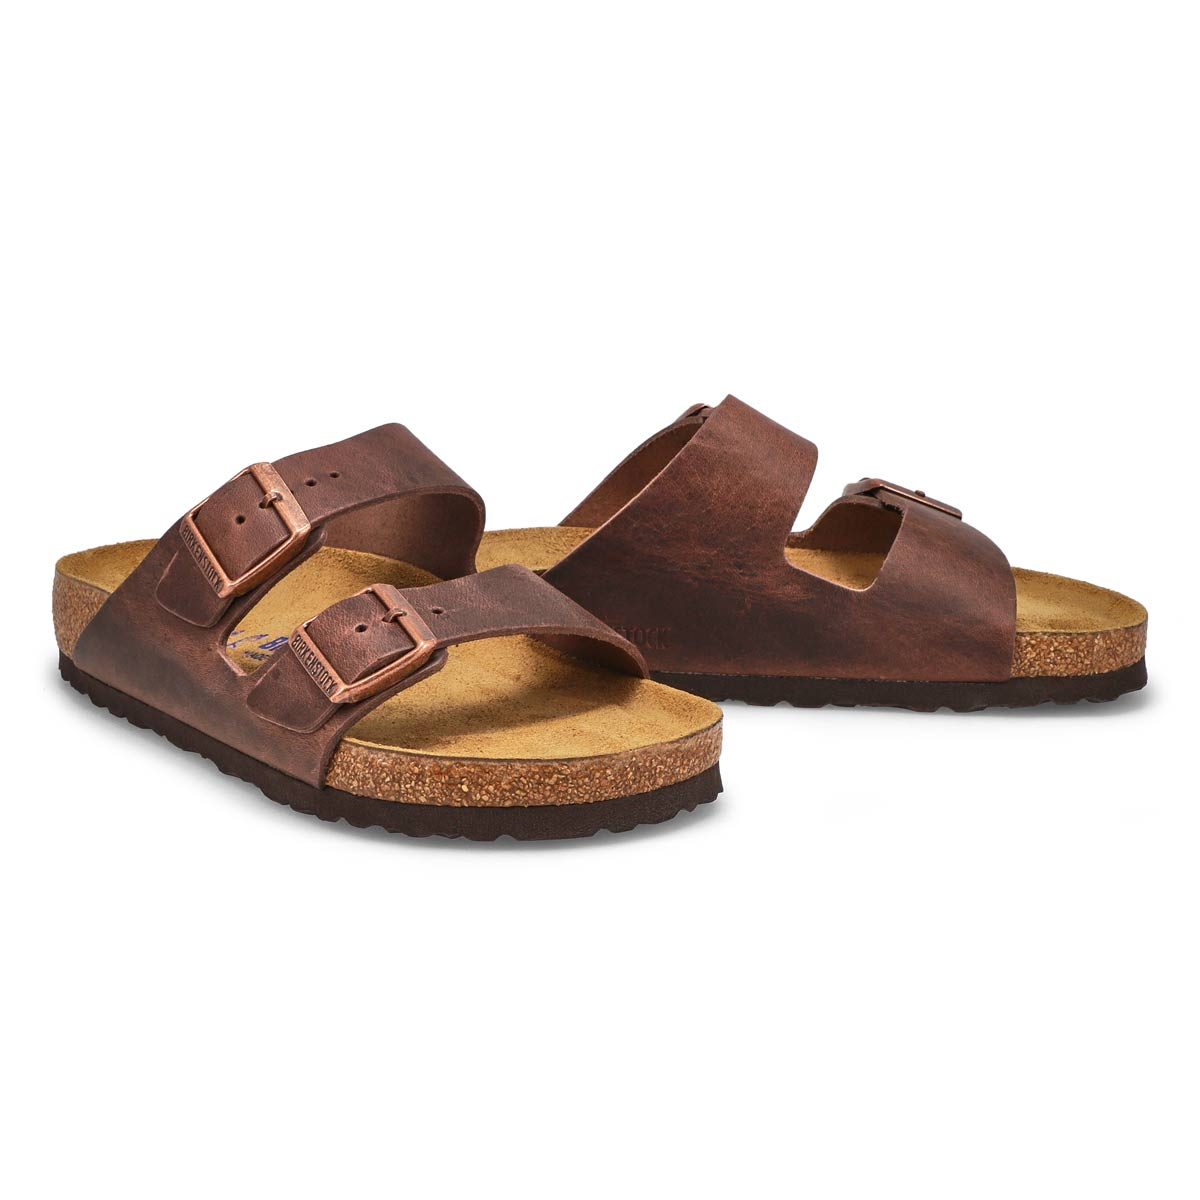 Lds Arizona SF Havana 2 strap sandal